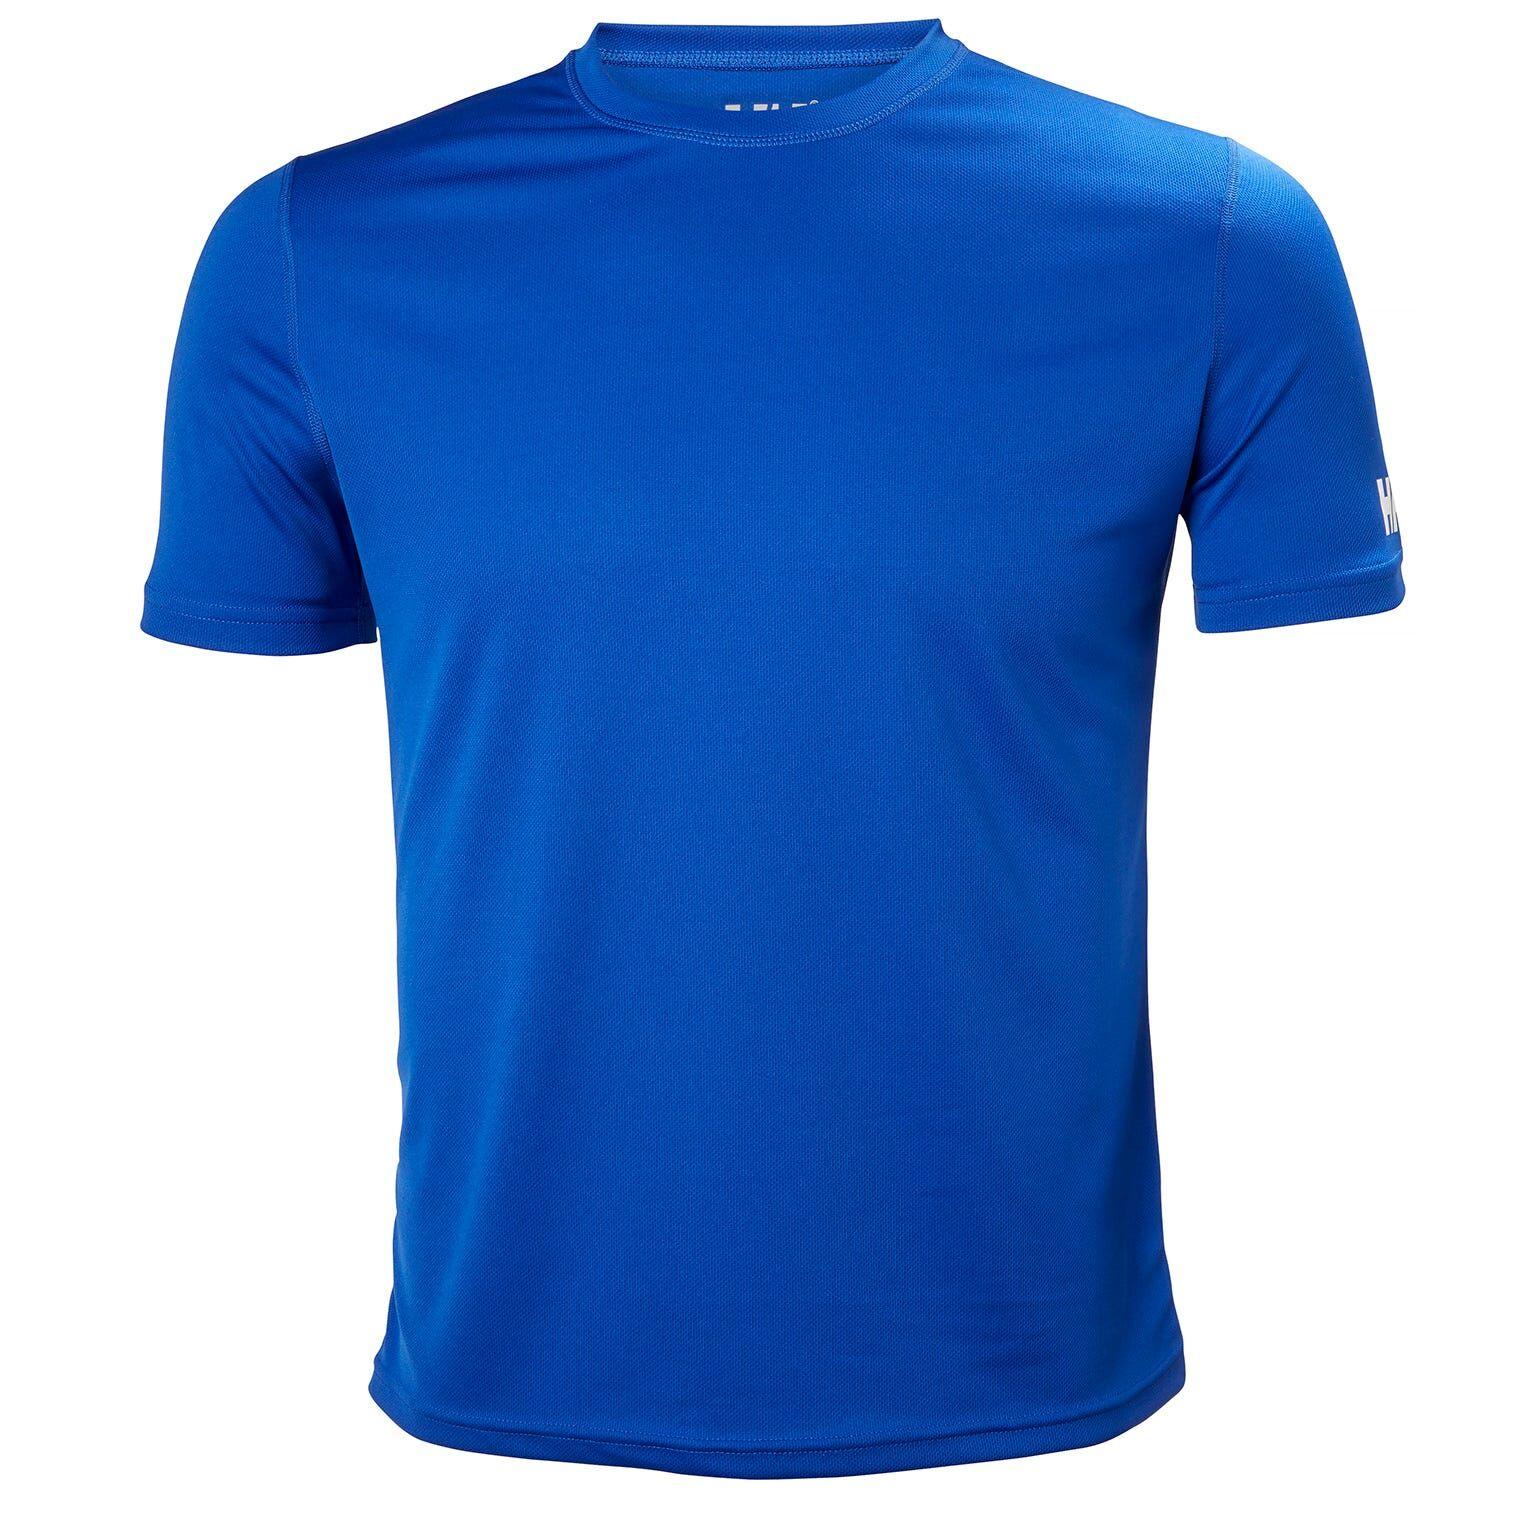 Helly Hansen Tech Tshirt Mens Baselayer Blue XXL